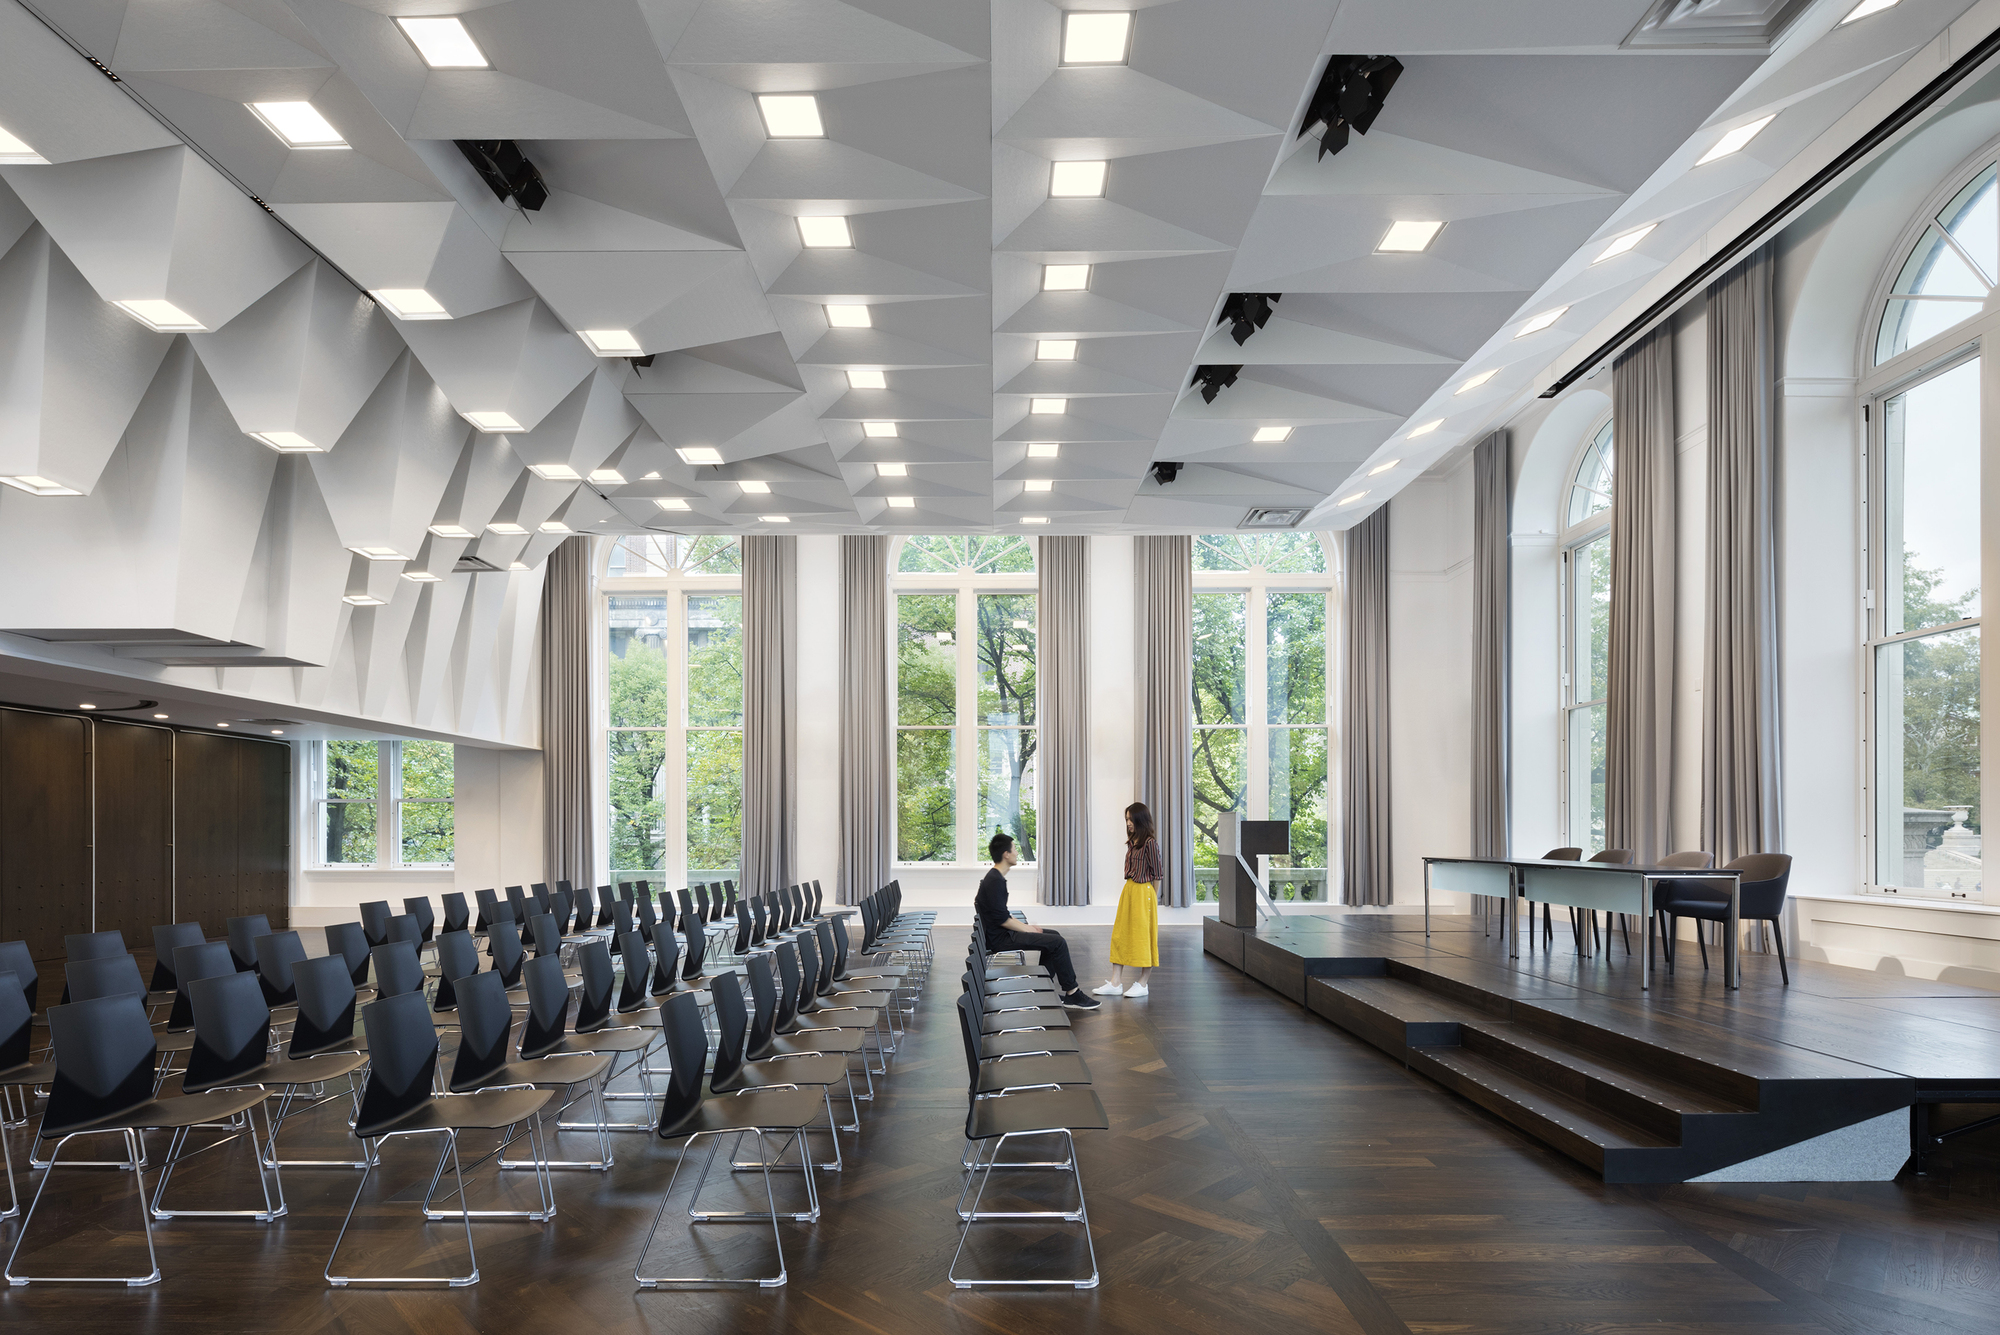 joseph d  jamail lecture hall    ltl architects